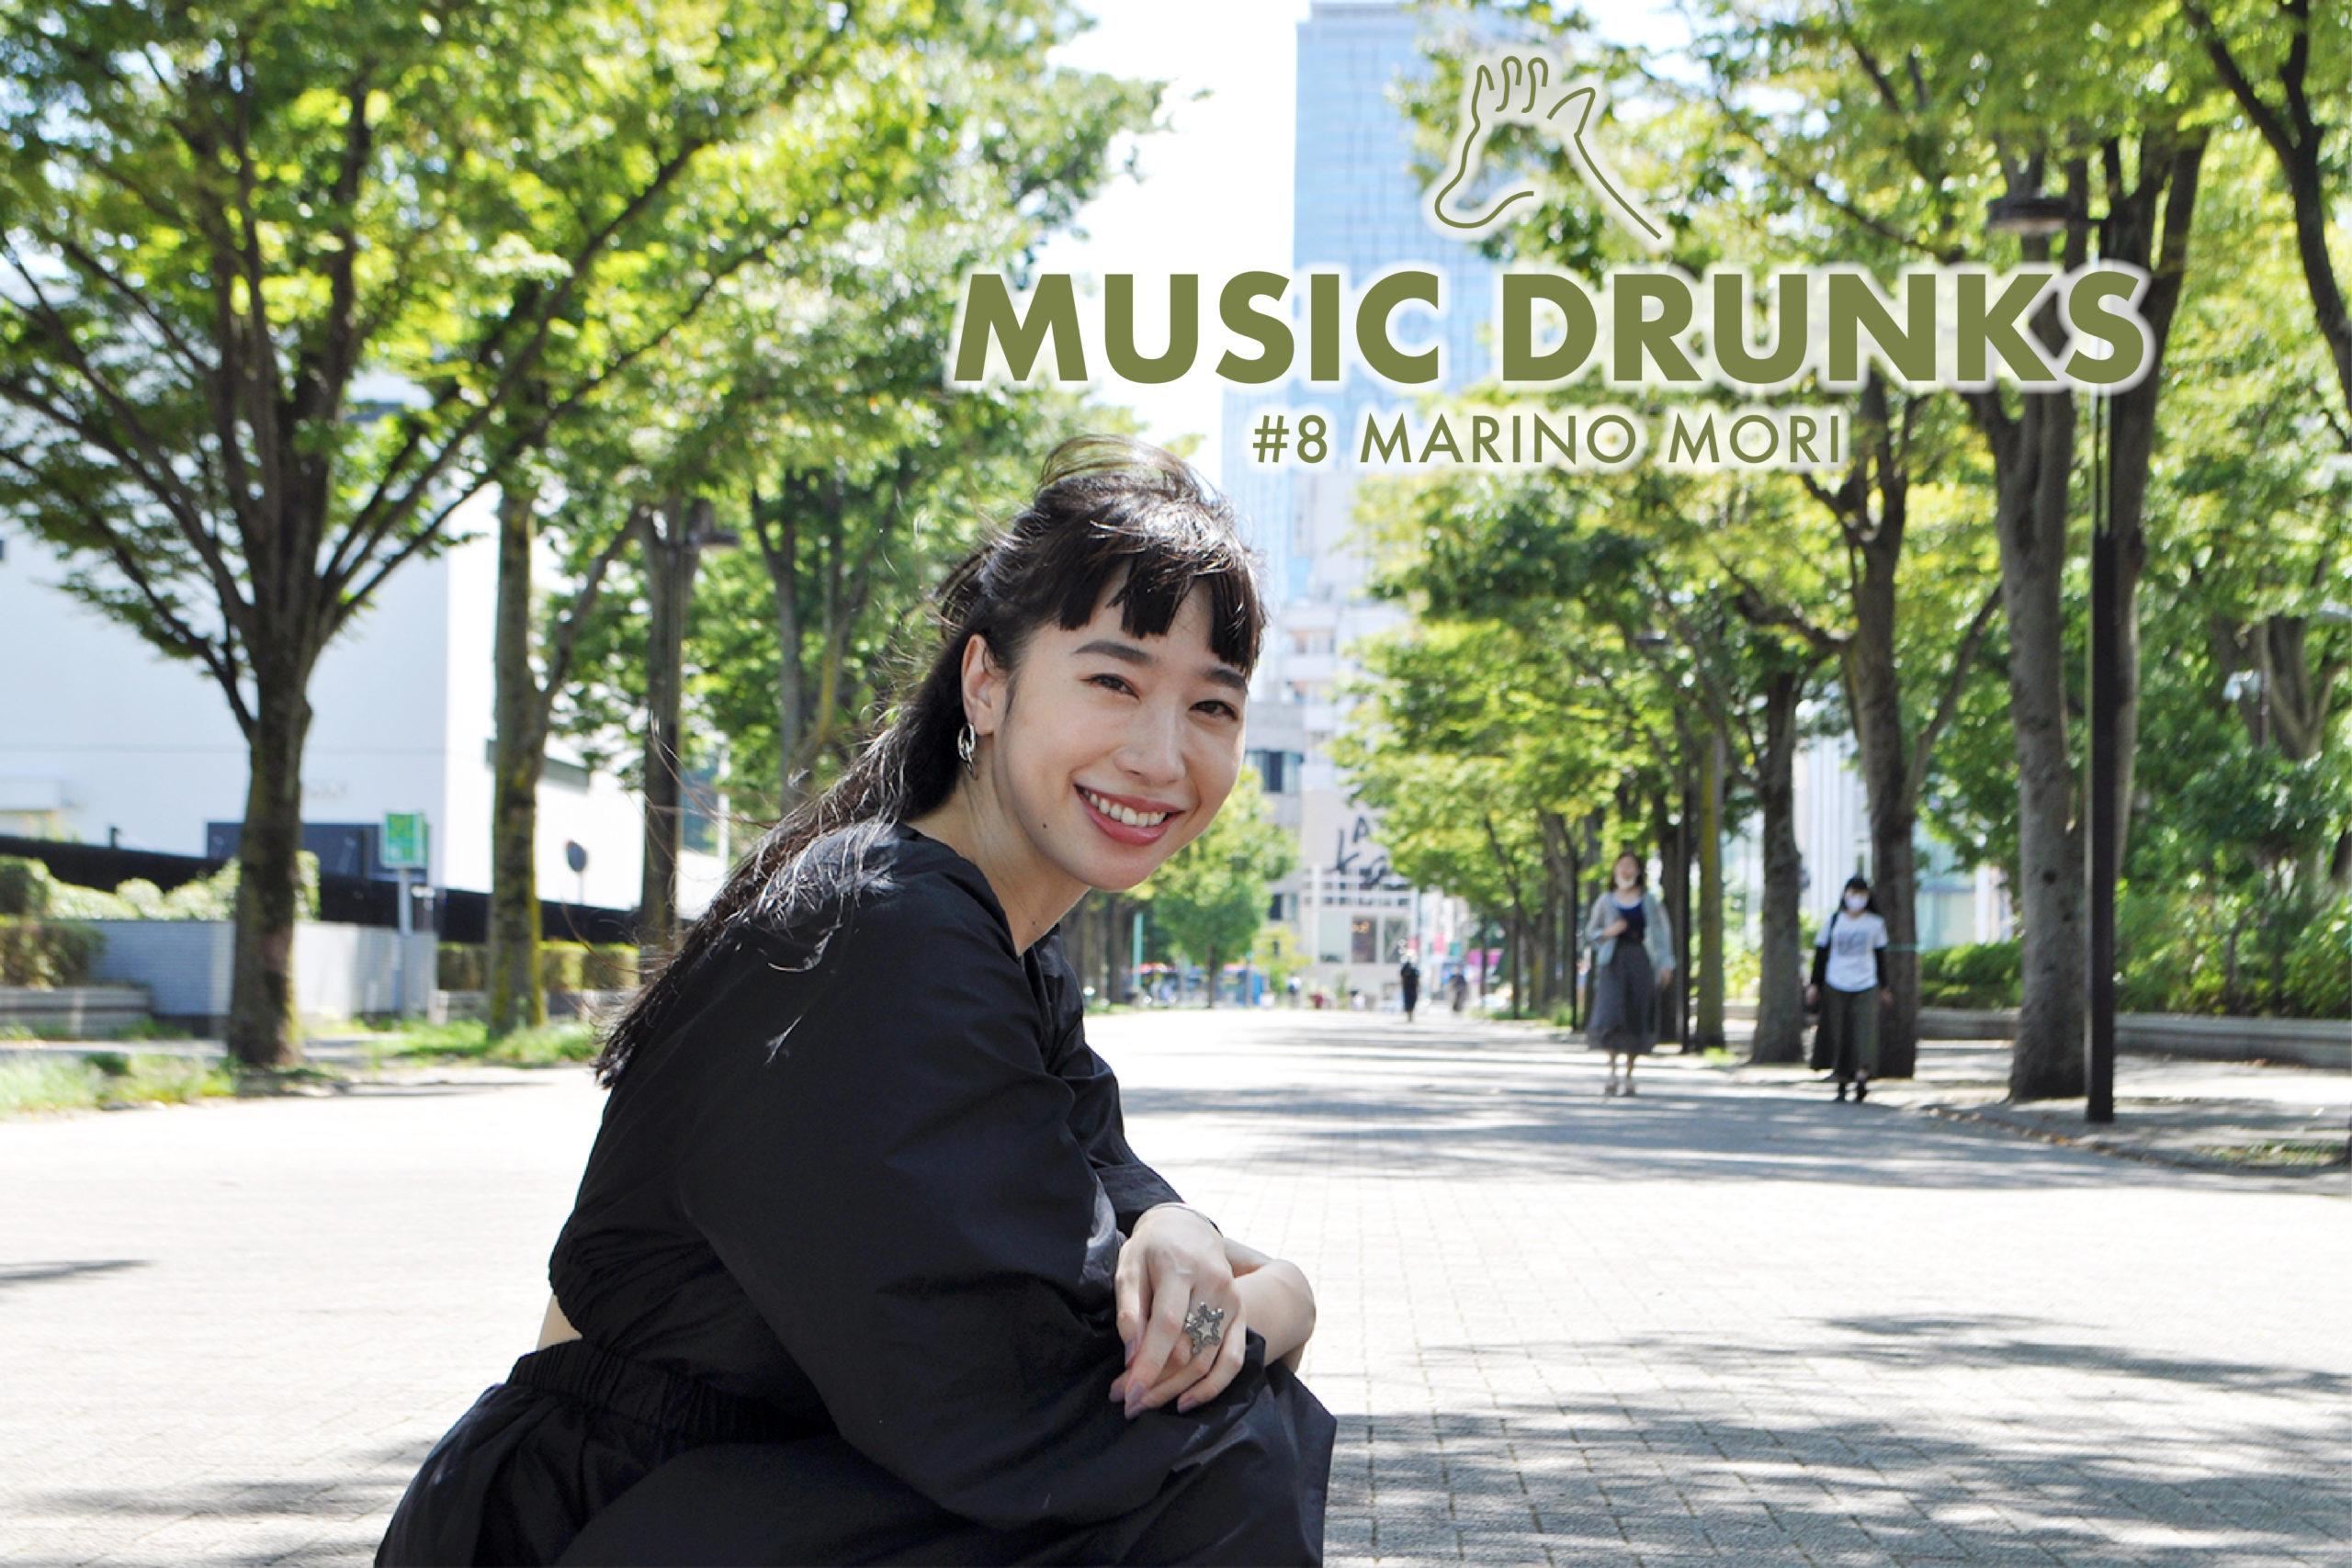 「【MUSIC DRUNKS #8】VC広報・森真梨乃 / 脳内をめちゃくちゃに混乱させてくれる、愛すべき音楽たち」のアイキャッチ画像